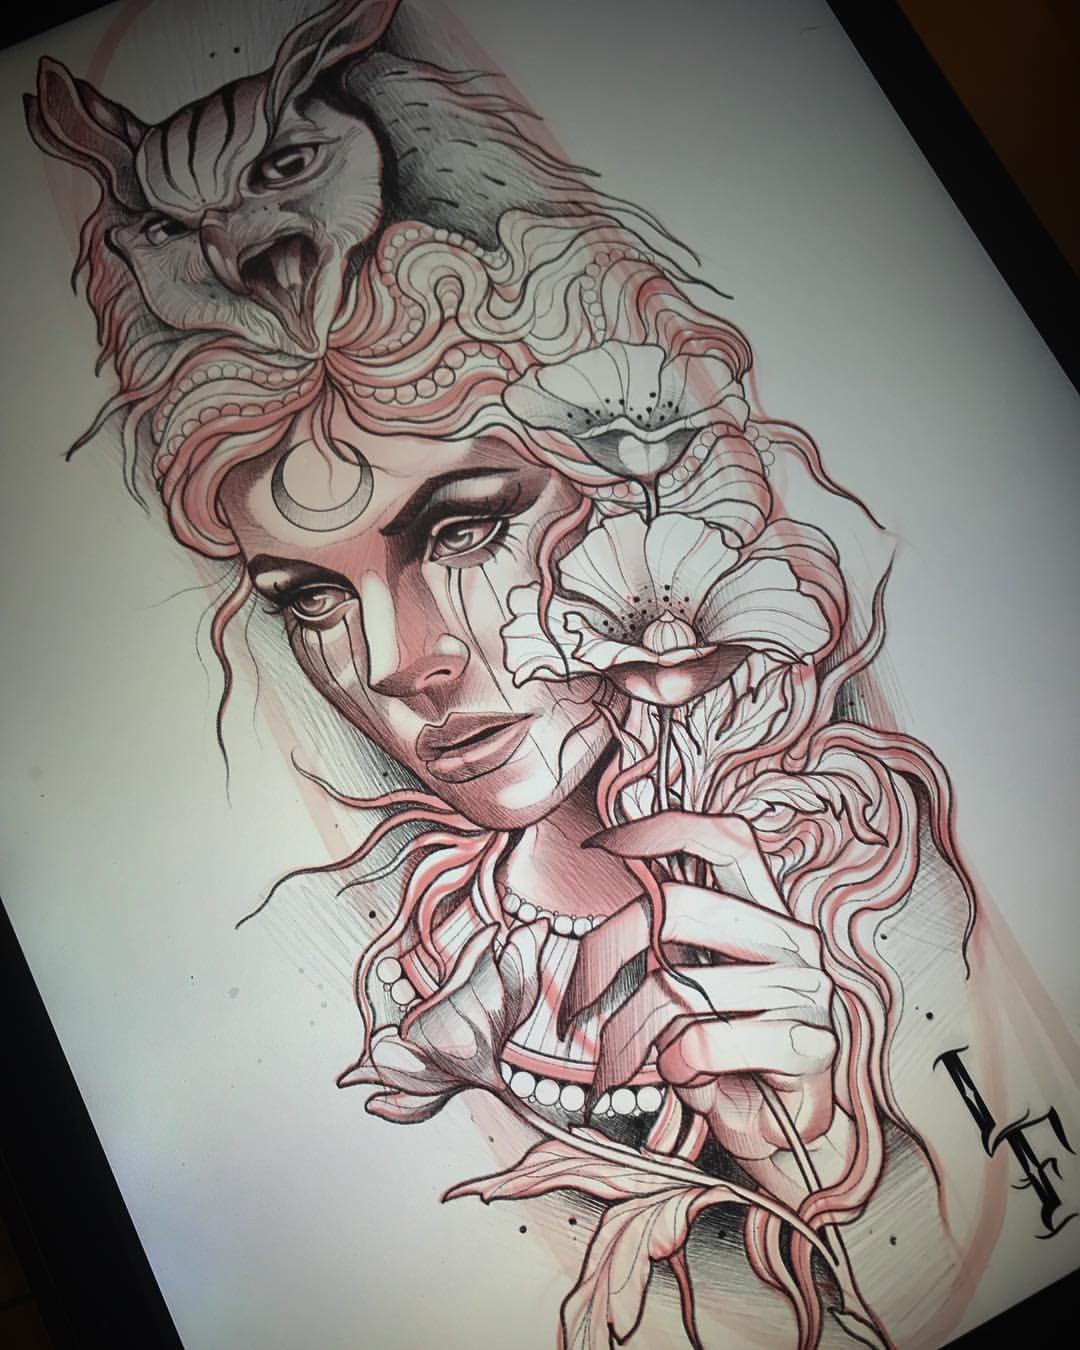 Photo of Lucas Ferreira sur Instagram: «Disponible. 👰🏼🦉🌸 Prendre des réservations jusqu'en décembre lucasferreiratattoo@gmail.com #tattoo #sketching #tattoodesign #newtraditionaltattoo»